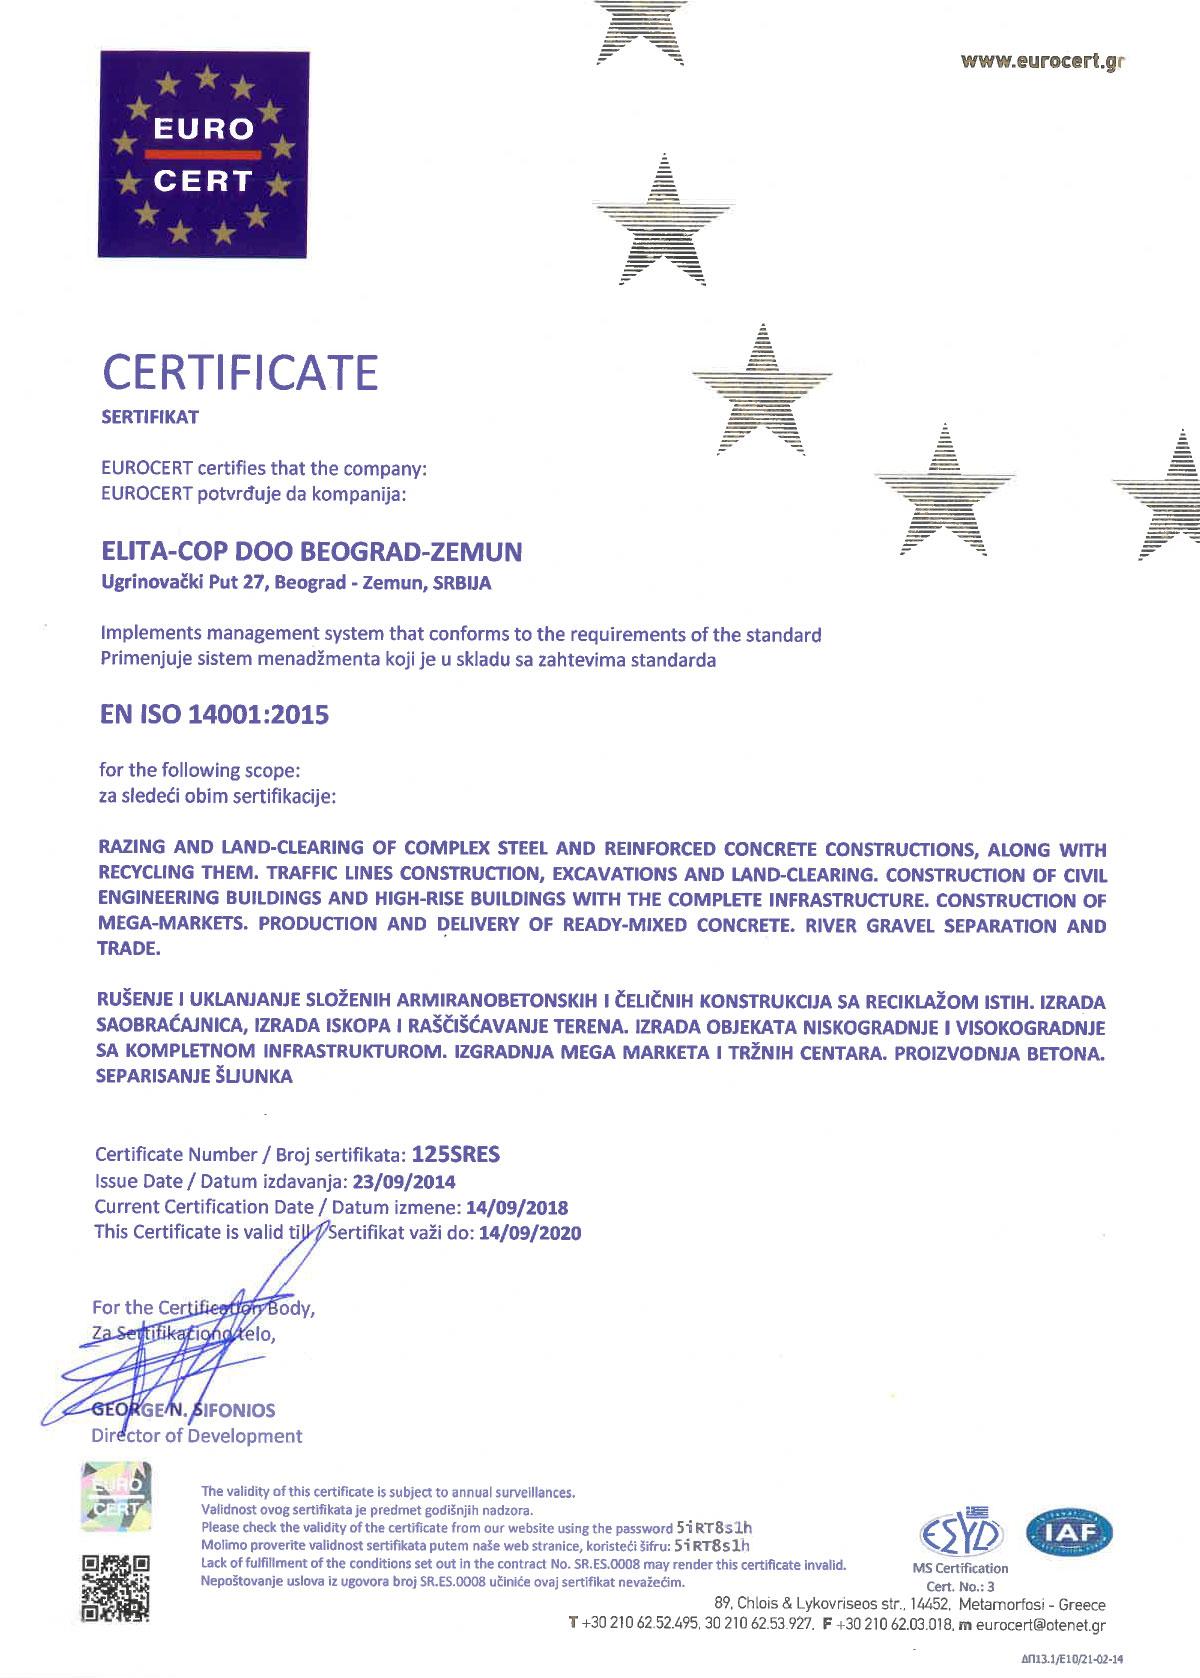 Elita Cop ISO 14001:2015